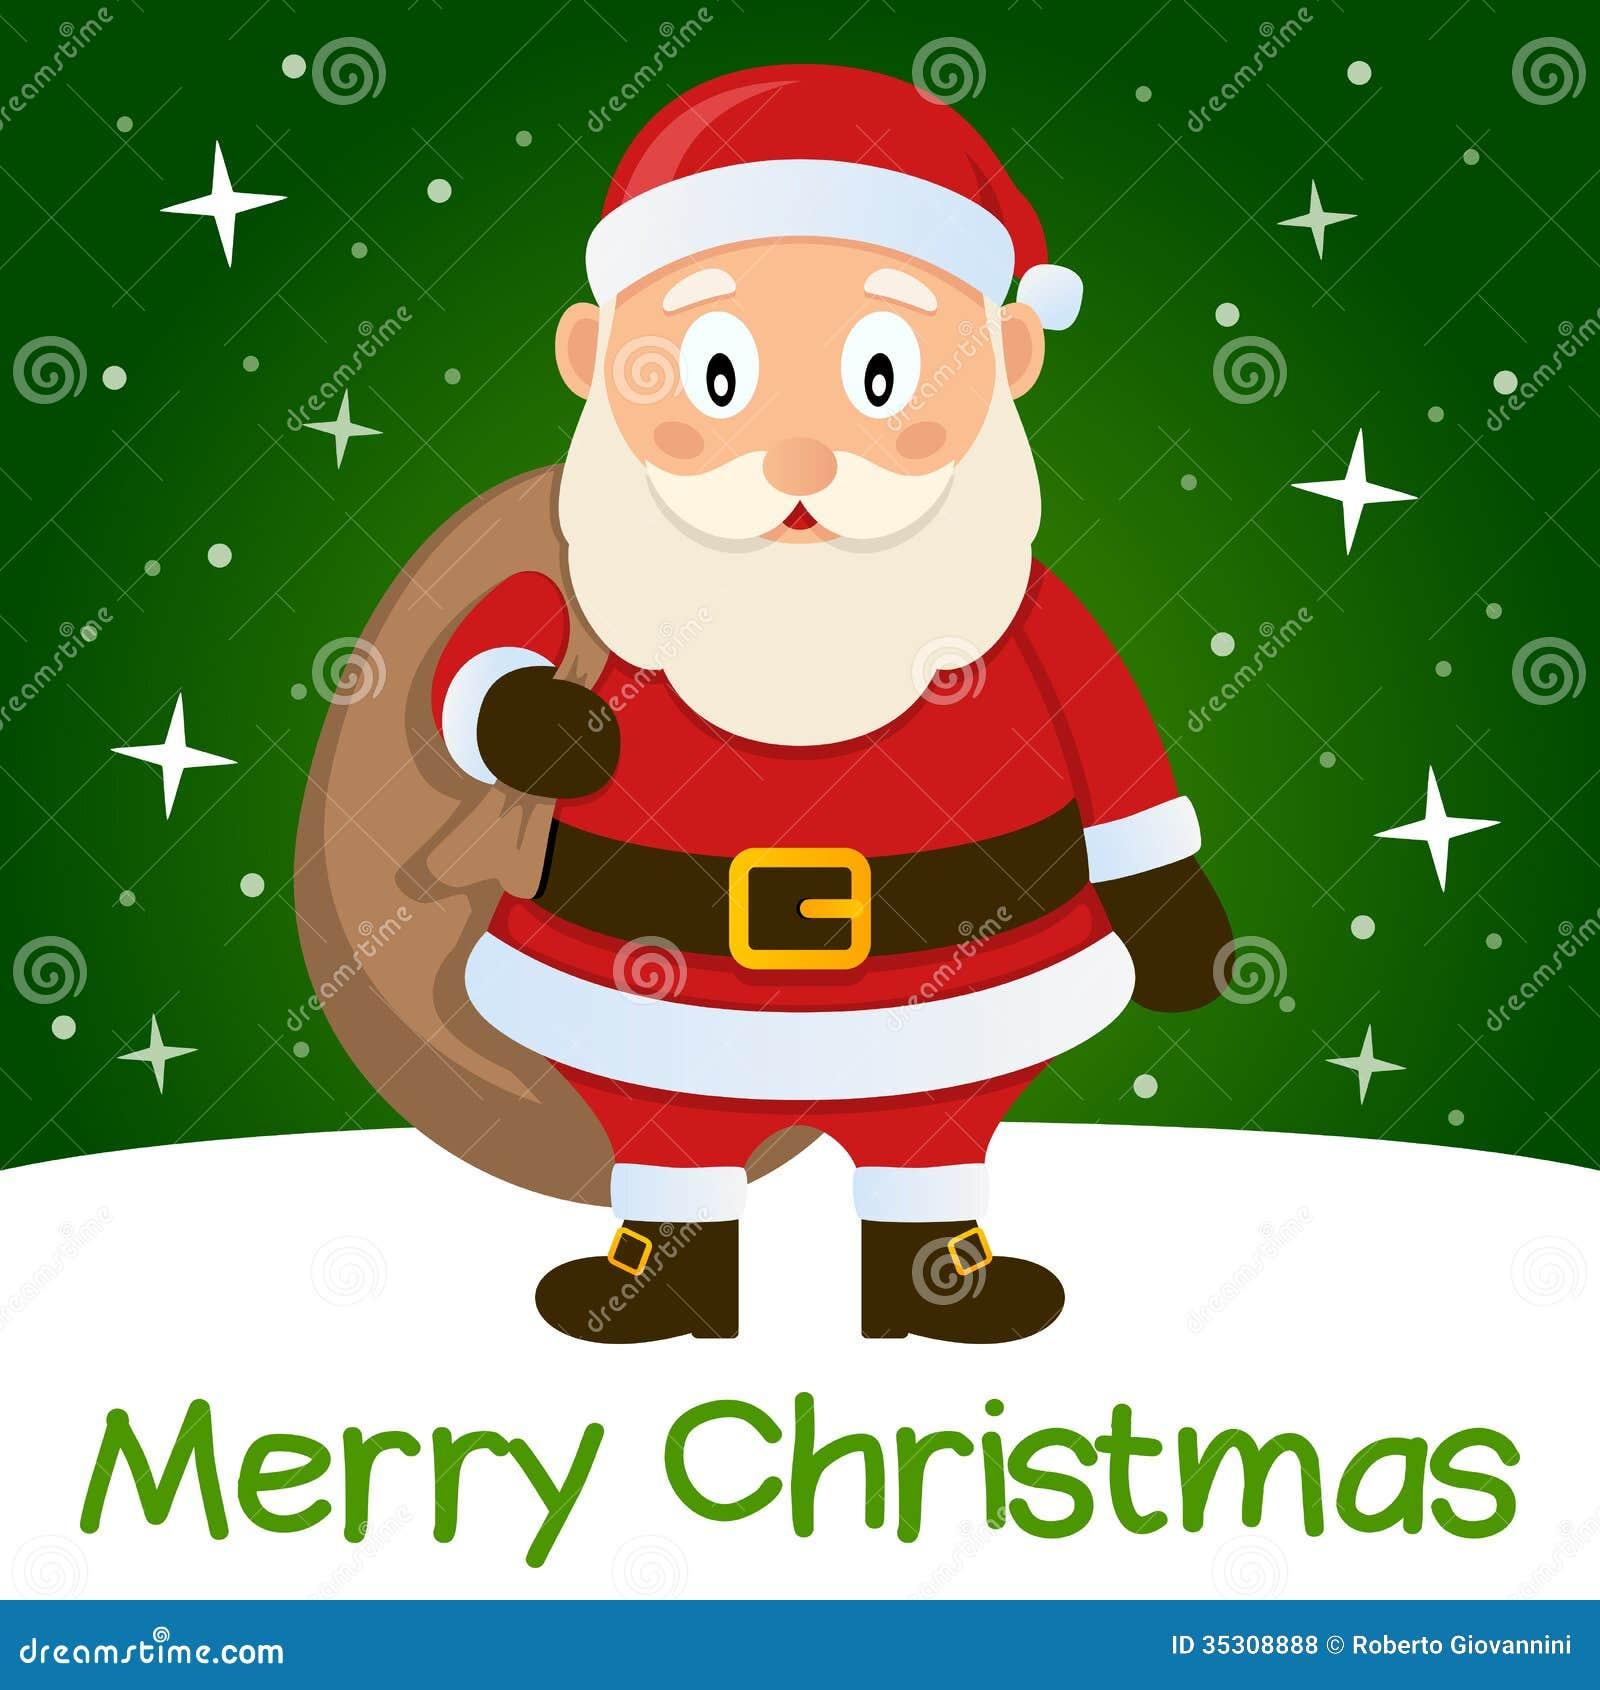 Green Christmas Card Santa Claus Stock Vector - Illustration of ...